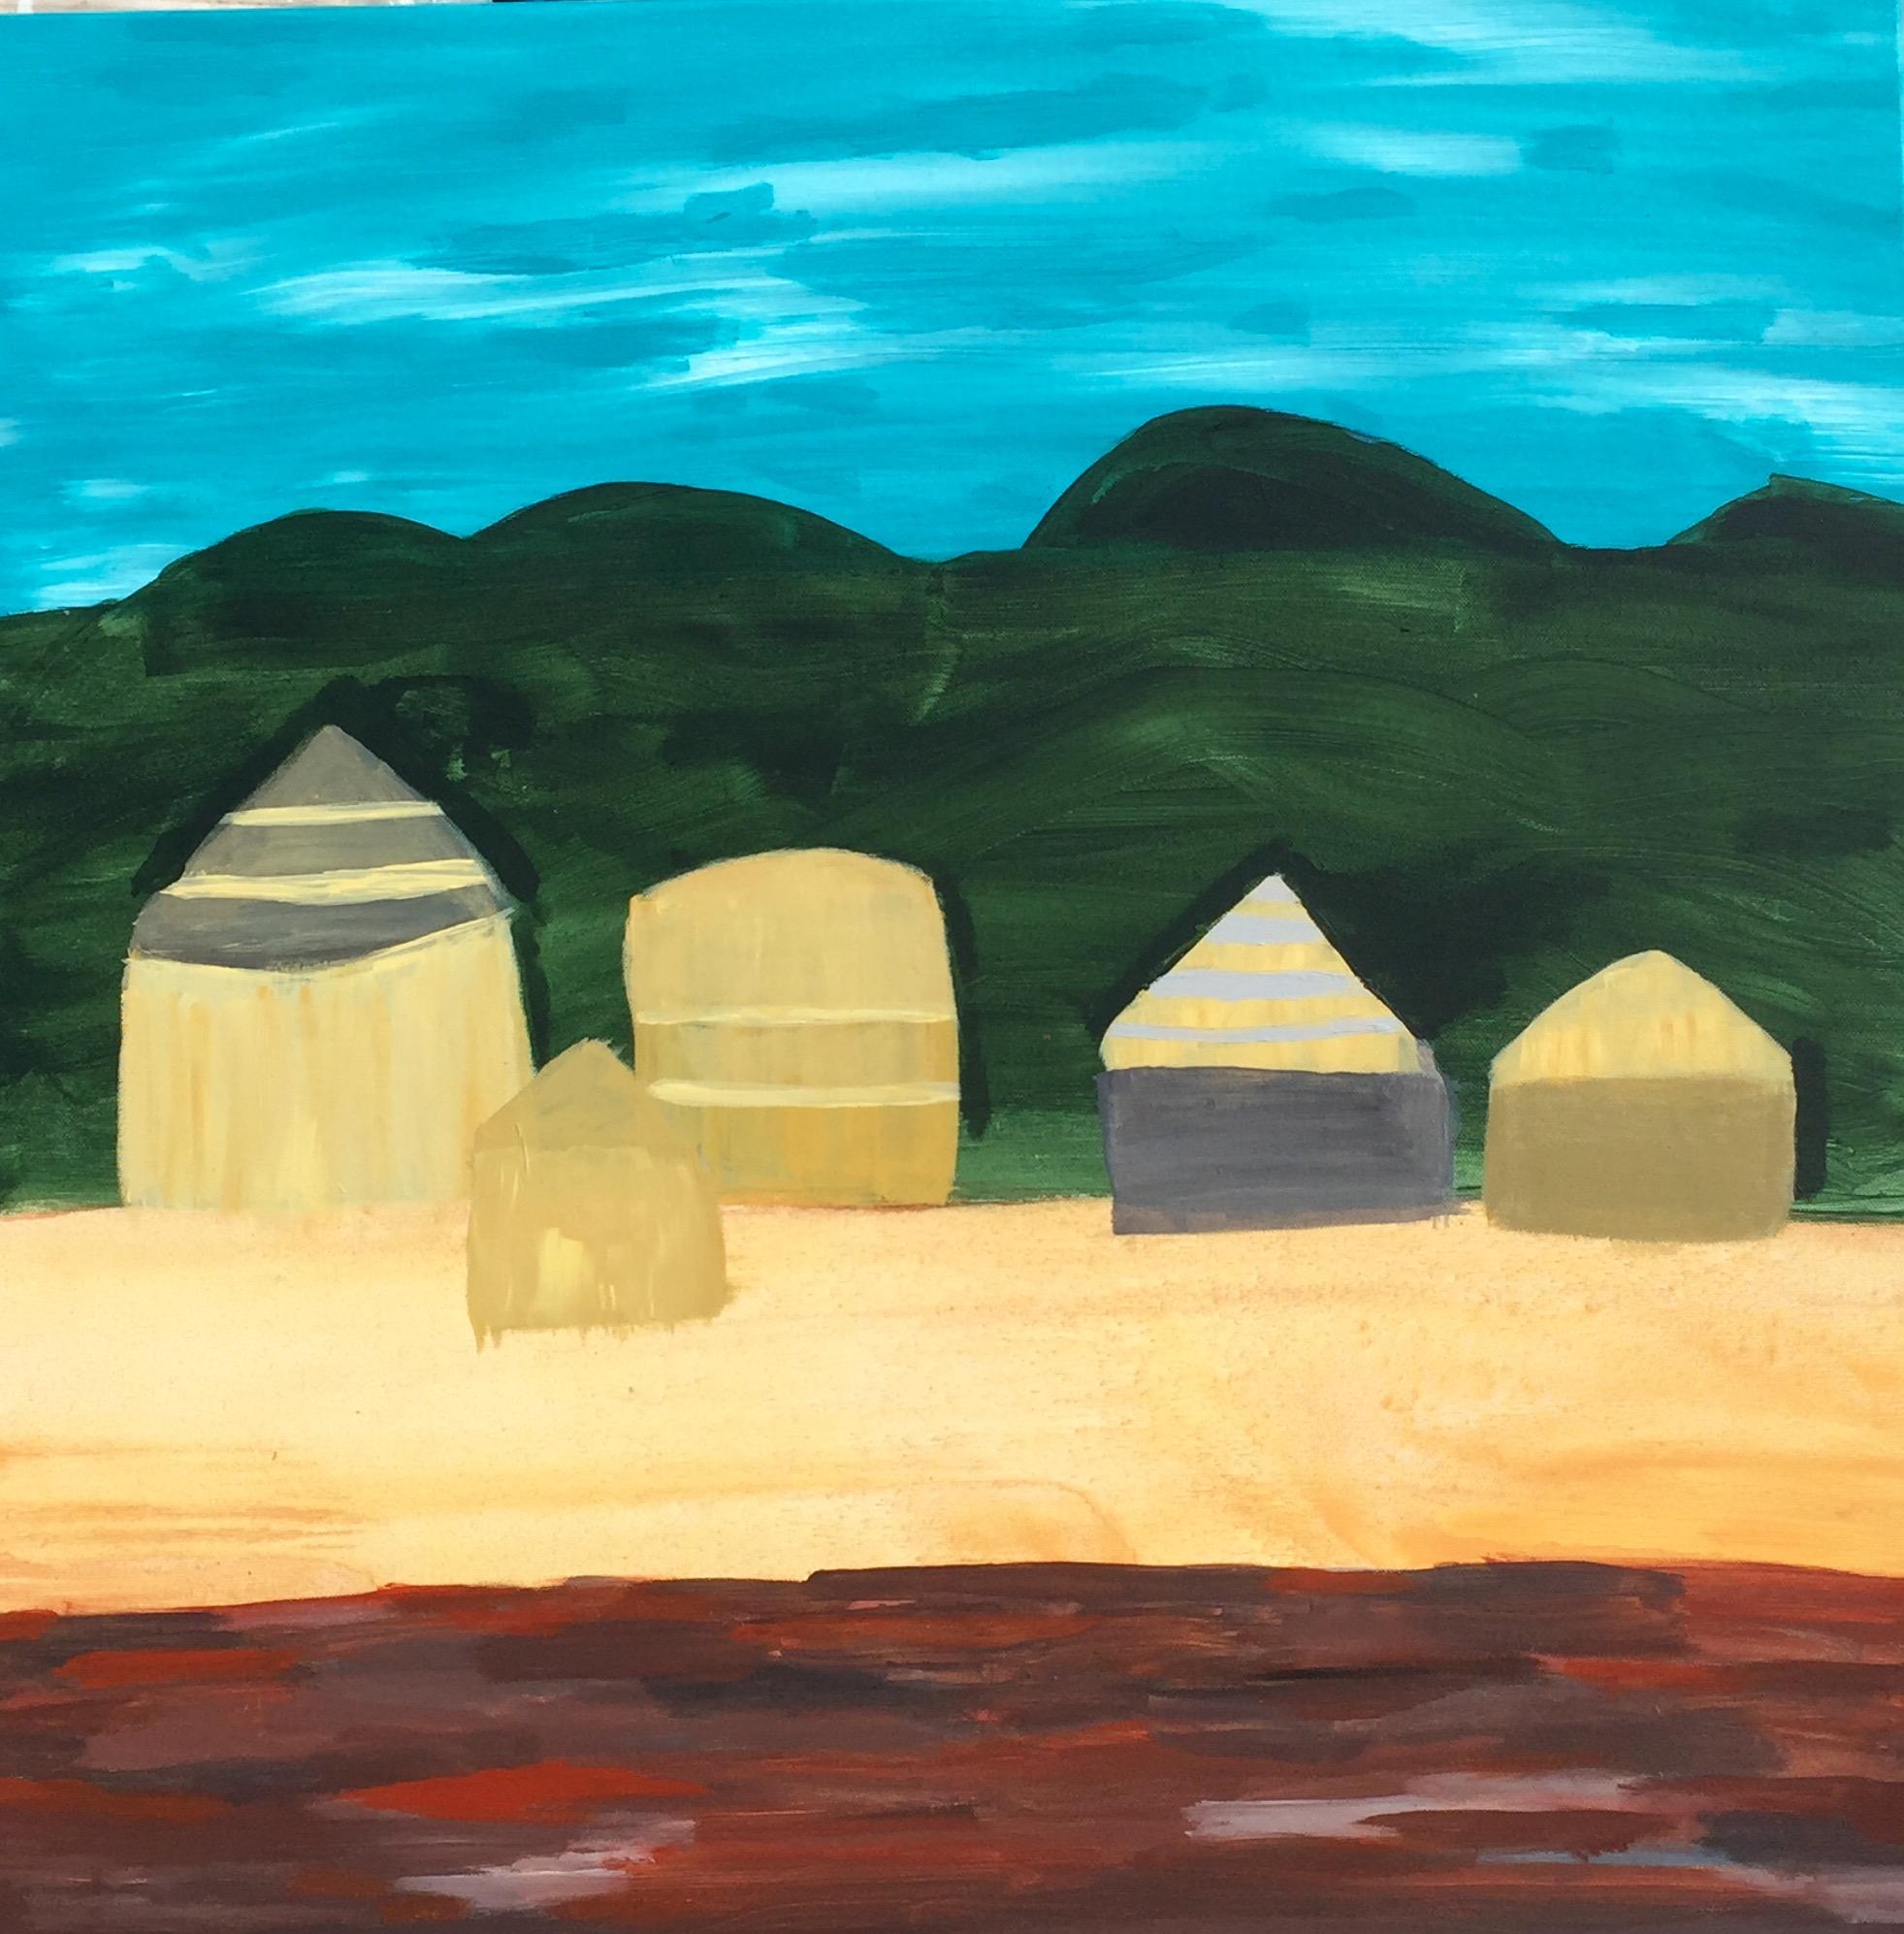 15 2016 Poor People in Straw Huts, Acrylic on Canvas, 76 X 76cm, Yaniv Janson.jpg